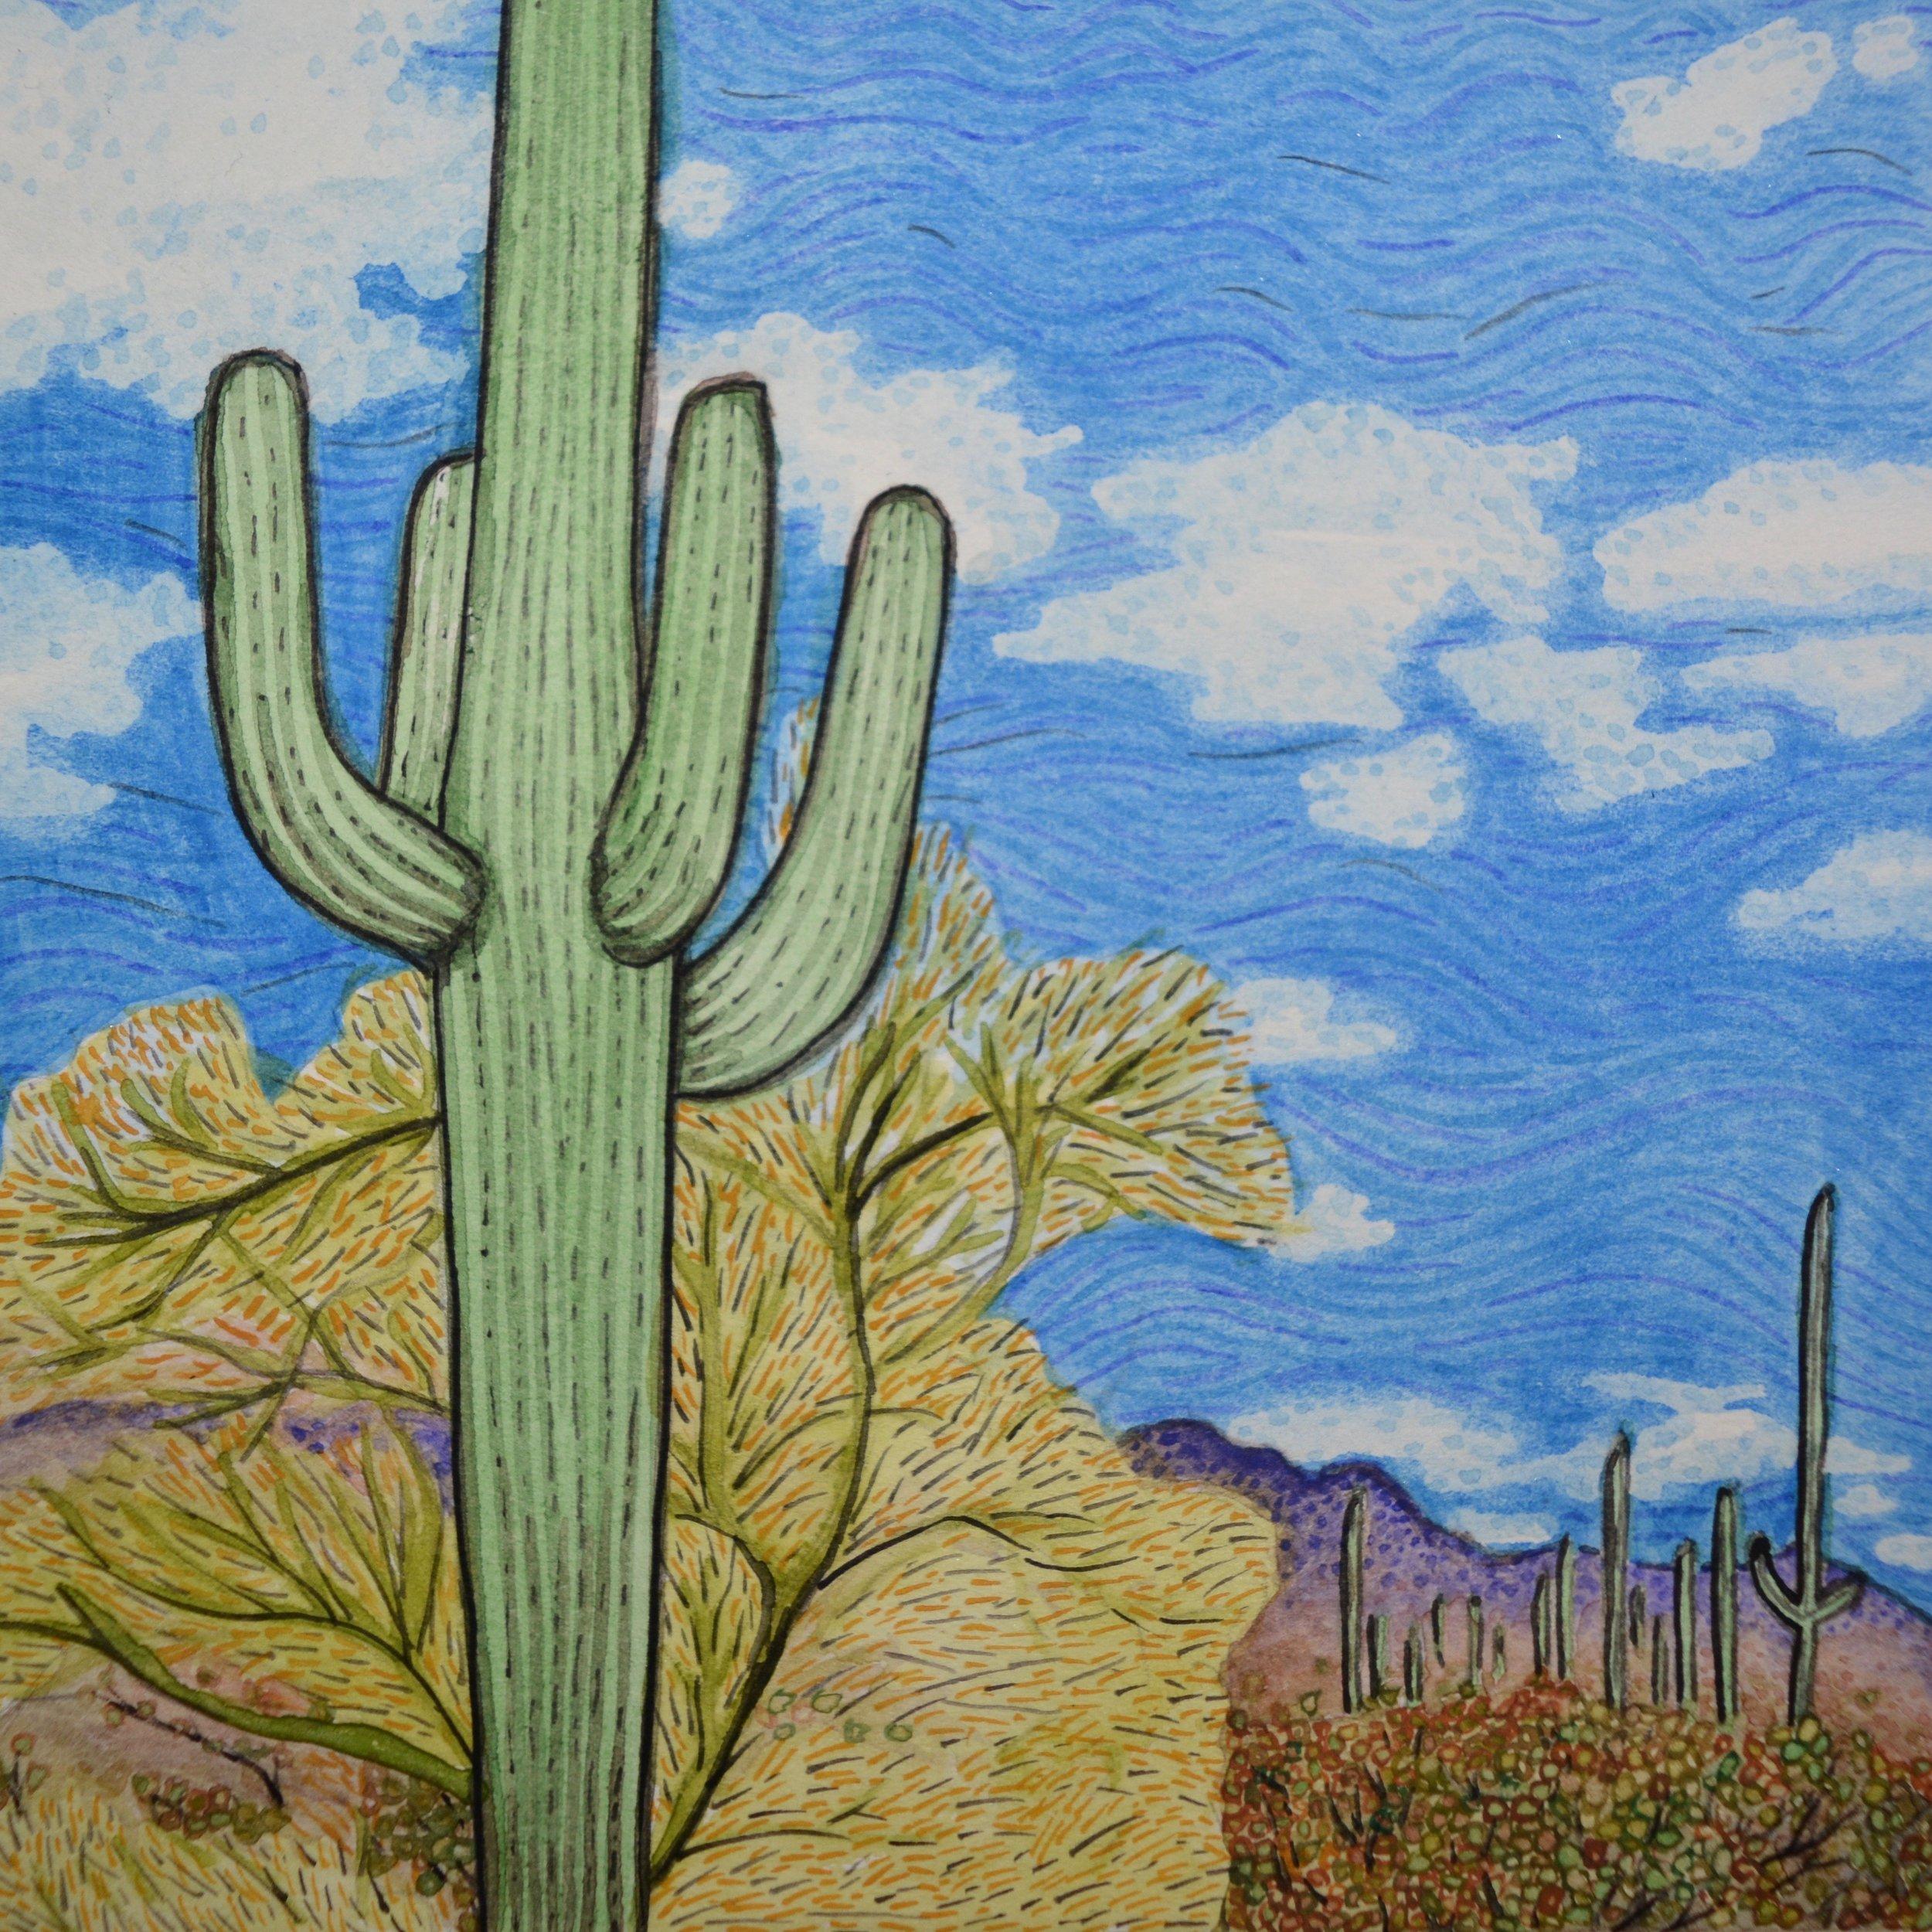 Organ Pipe Cactus National Monument, Arizona: 1/24/17, 16:57:46